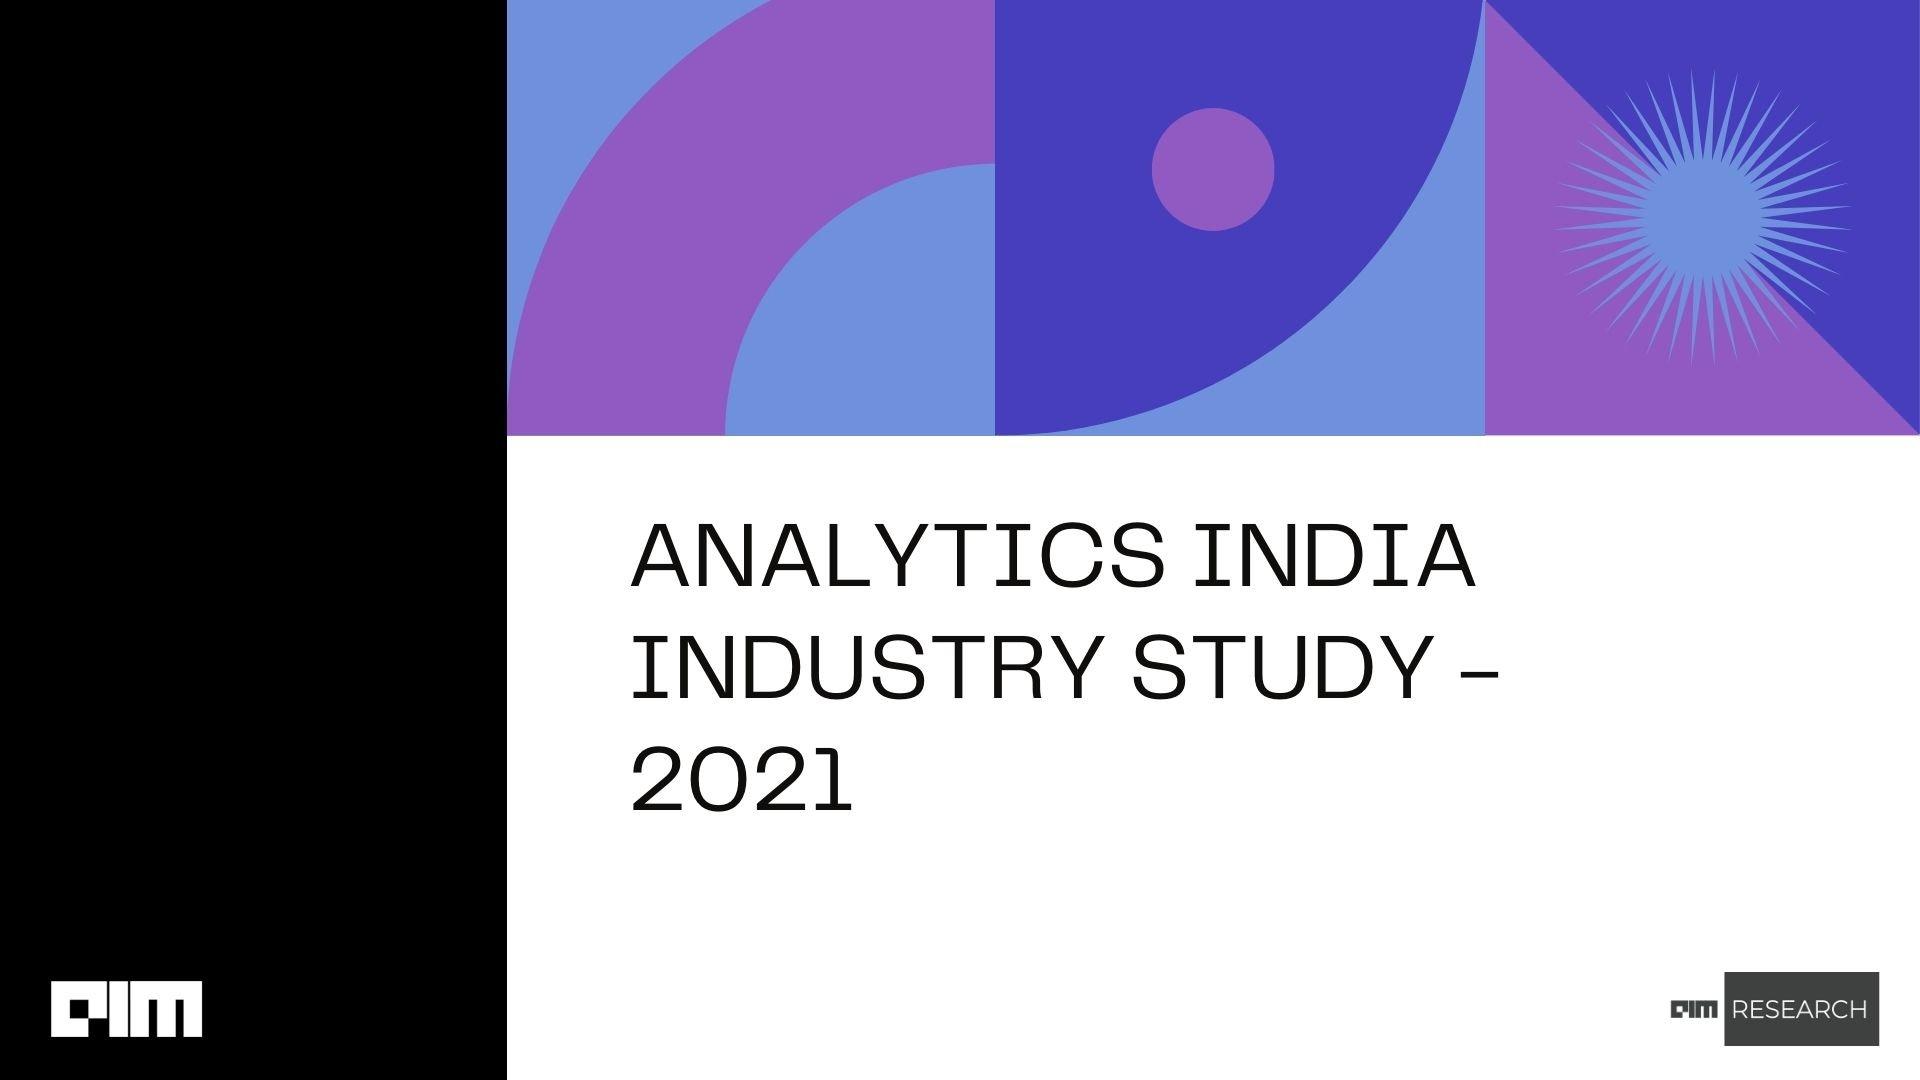 Analytics India Industry Study 2021